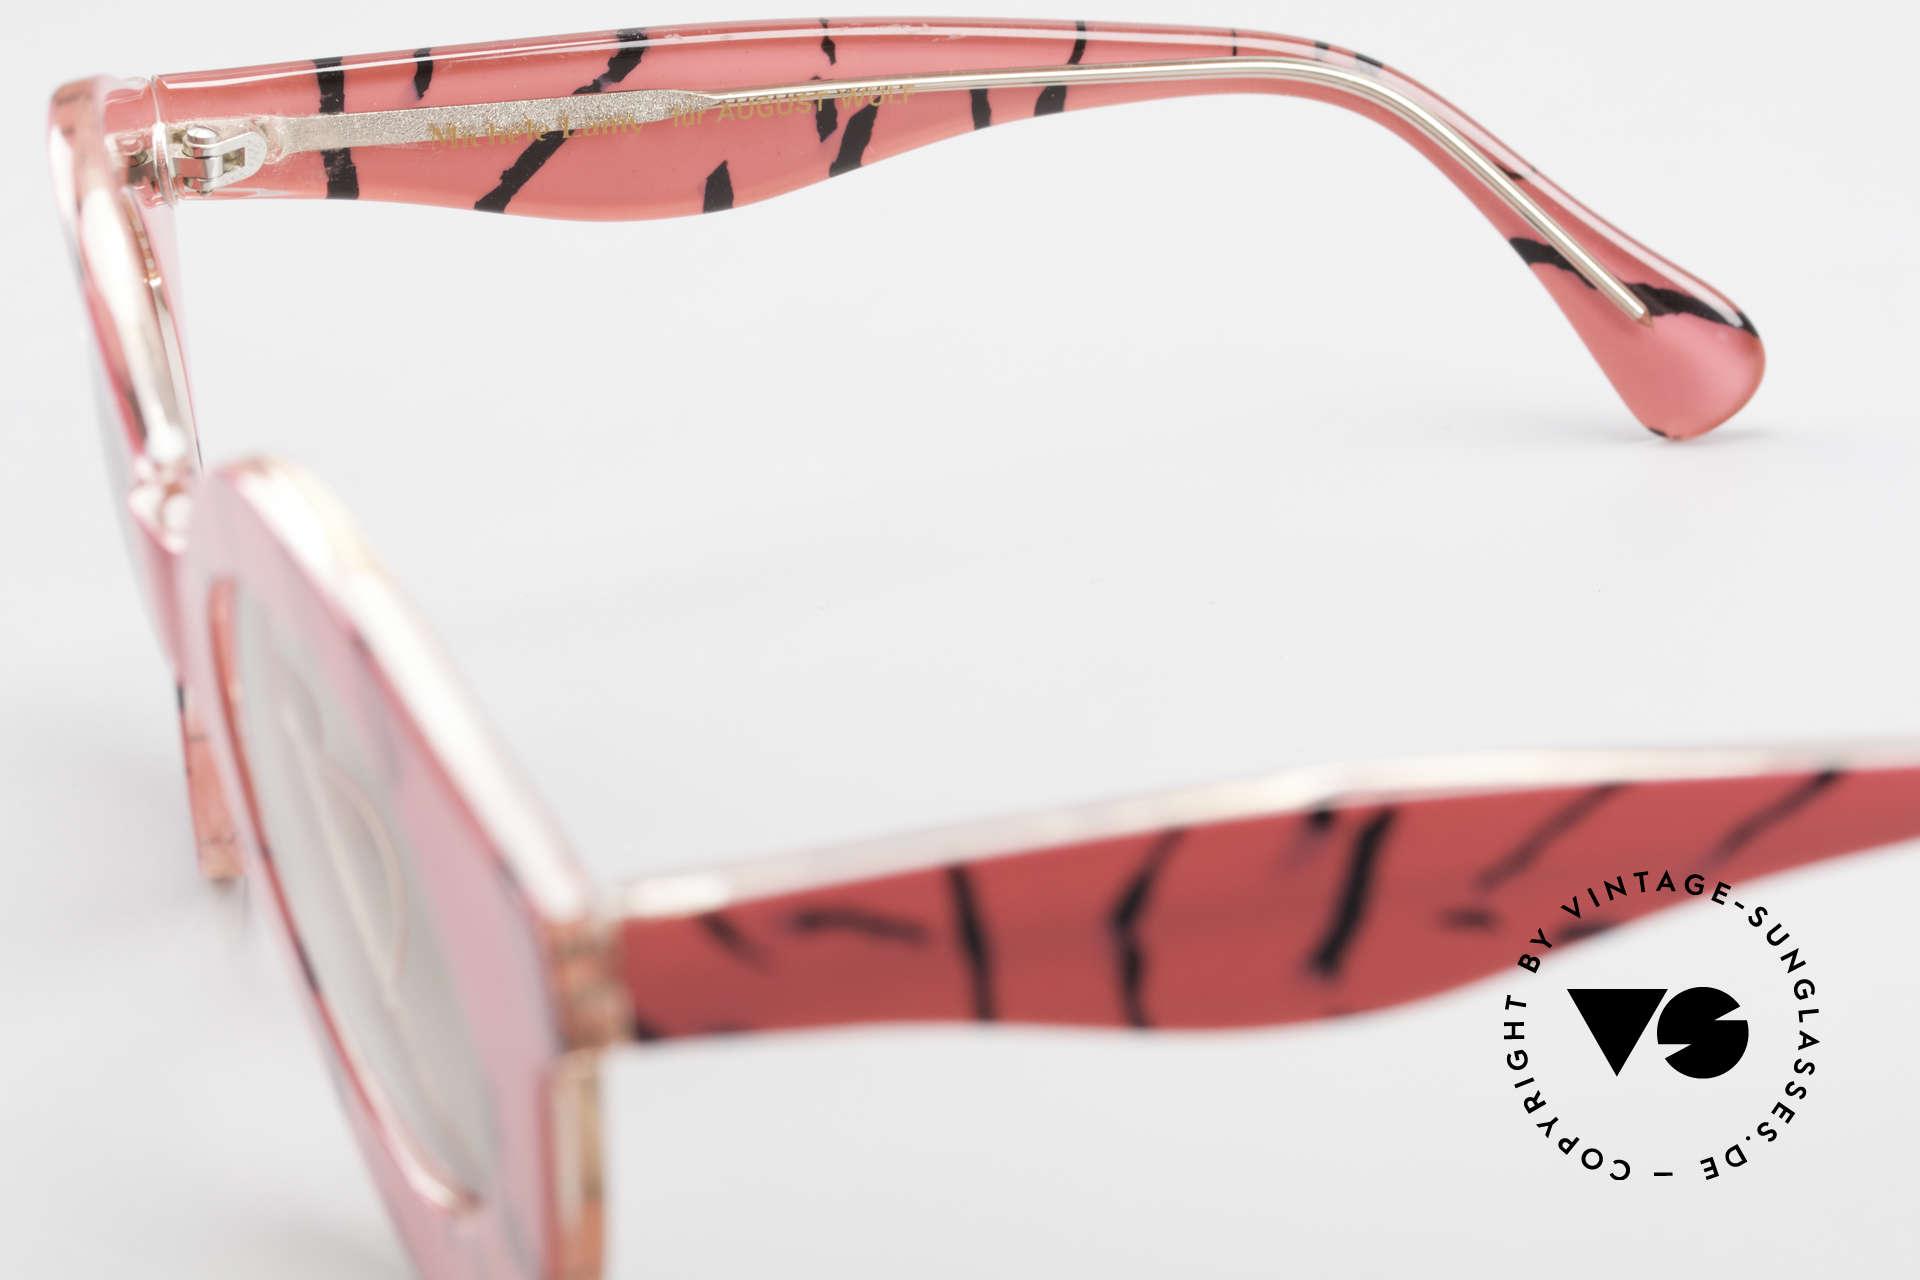 Michèle Lamy - Rita True Connoisseur Sunglasses, Size: large, Made for Women